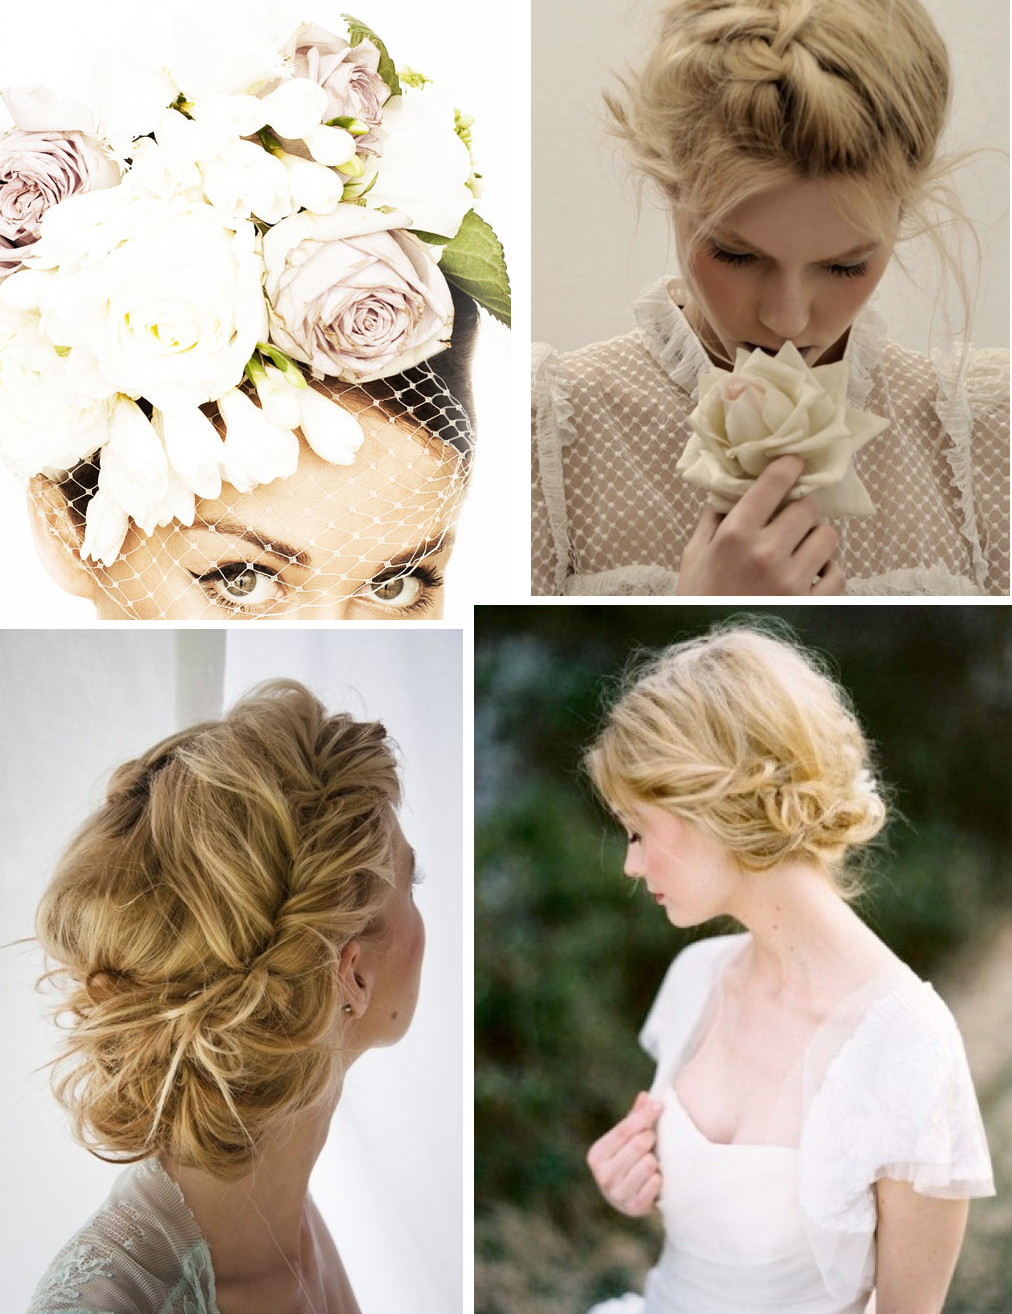 Best ideas about DIY Wedding Updo . Save or Pin DIY wedding hair tutorials bridal beauty celebrity Now.